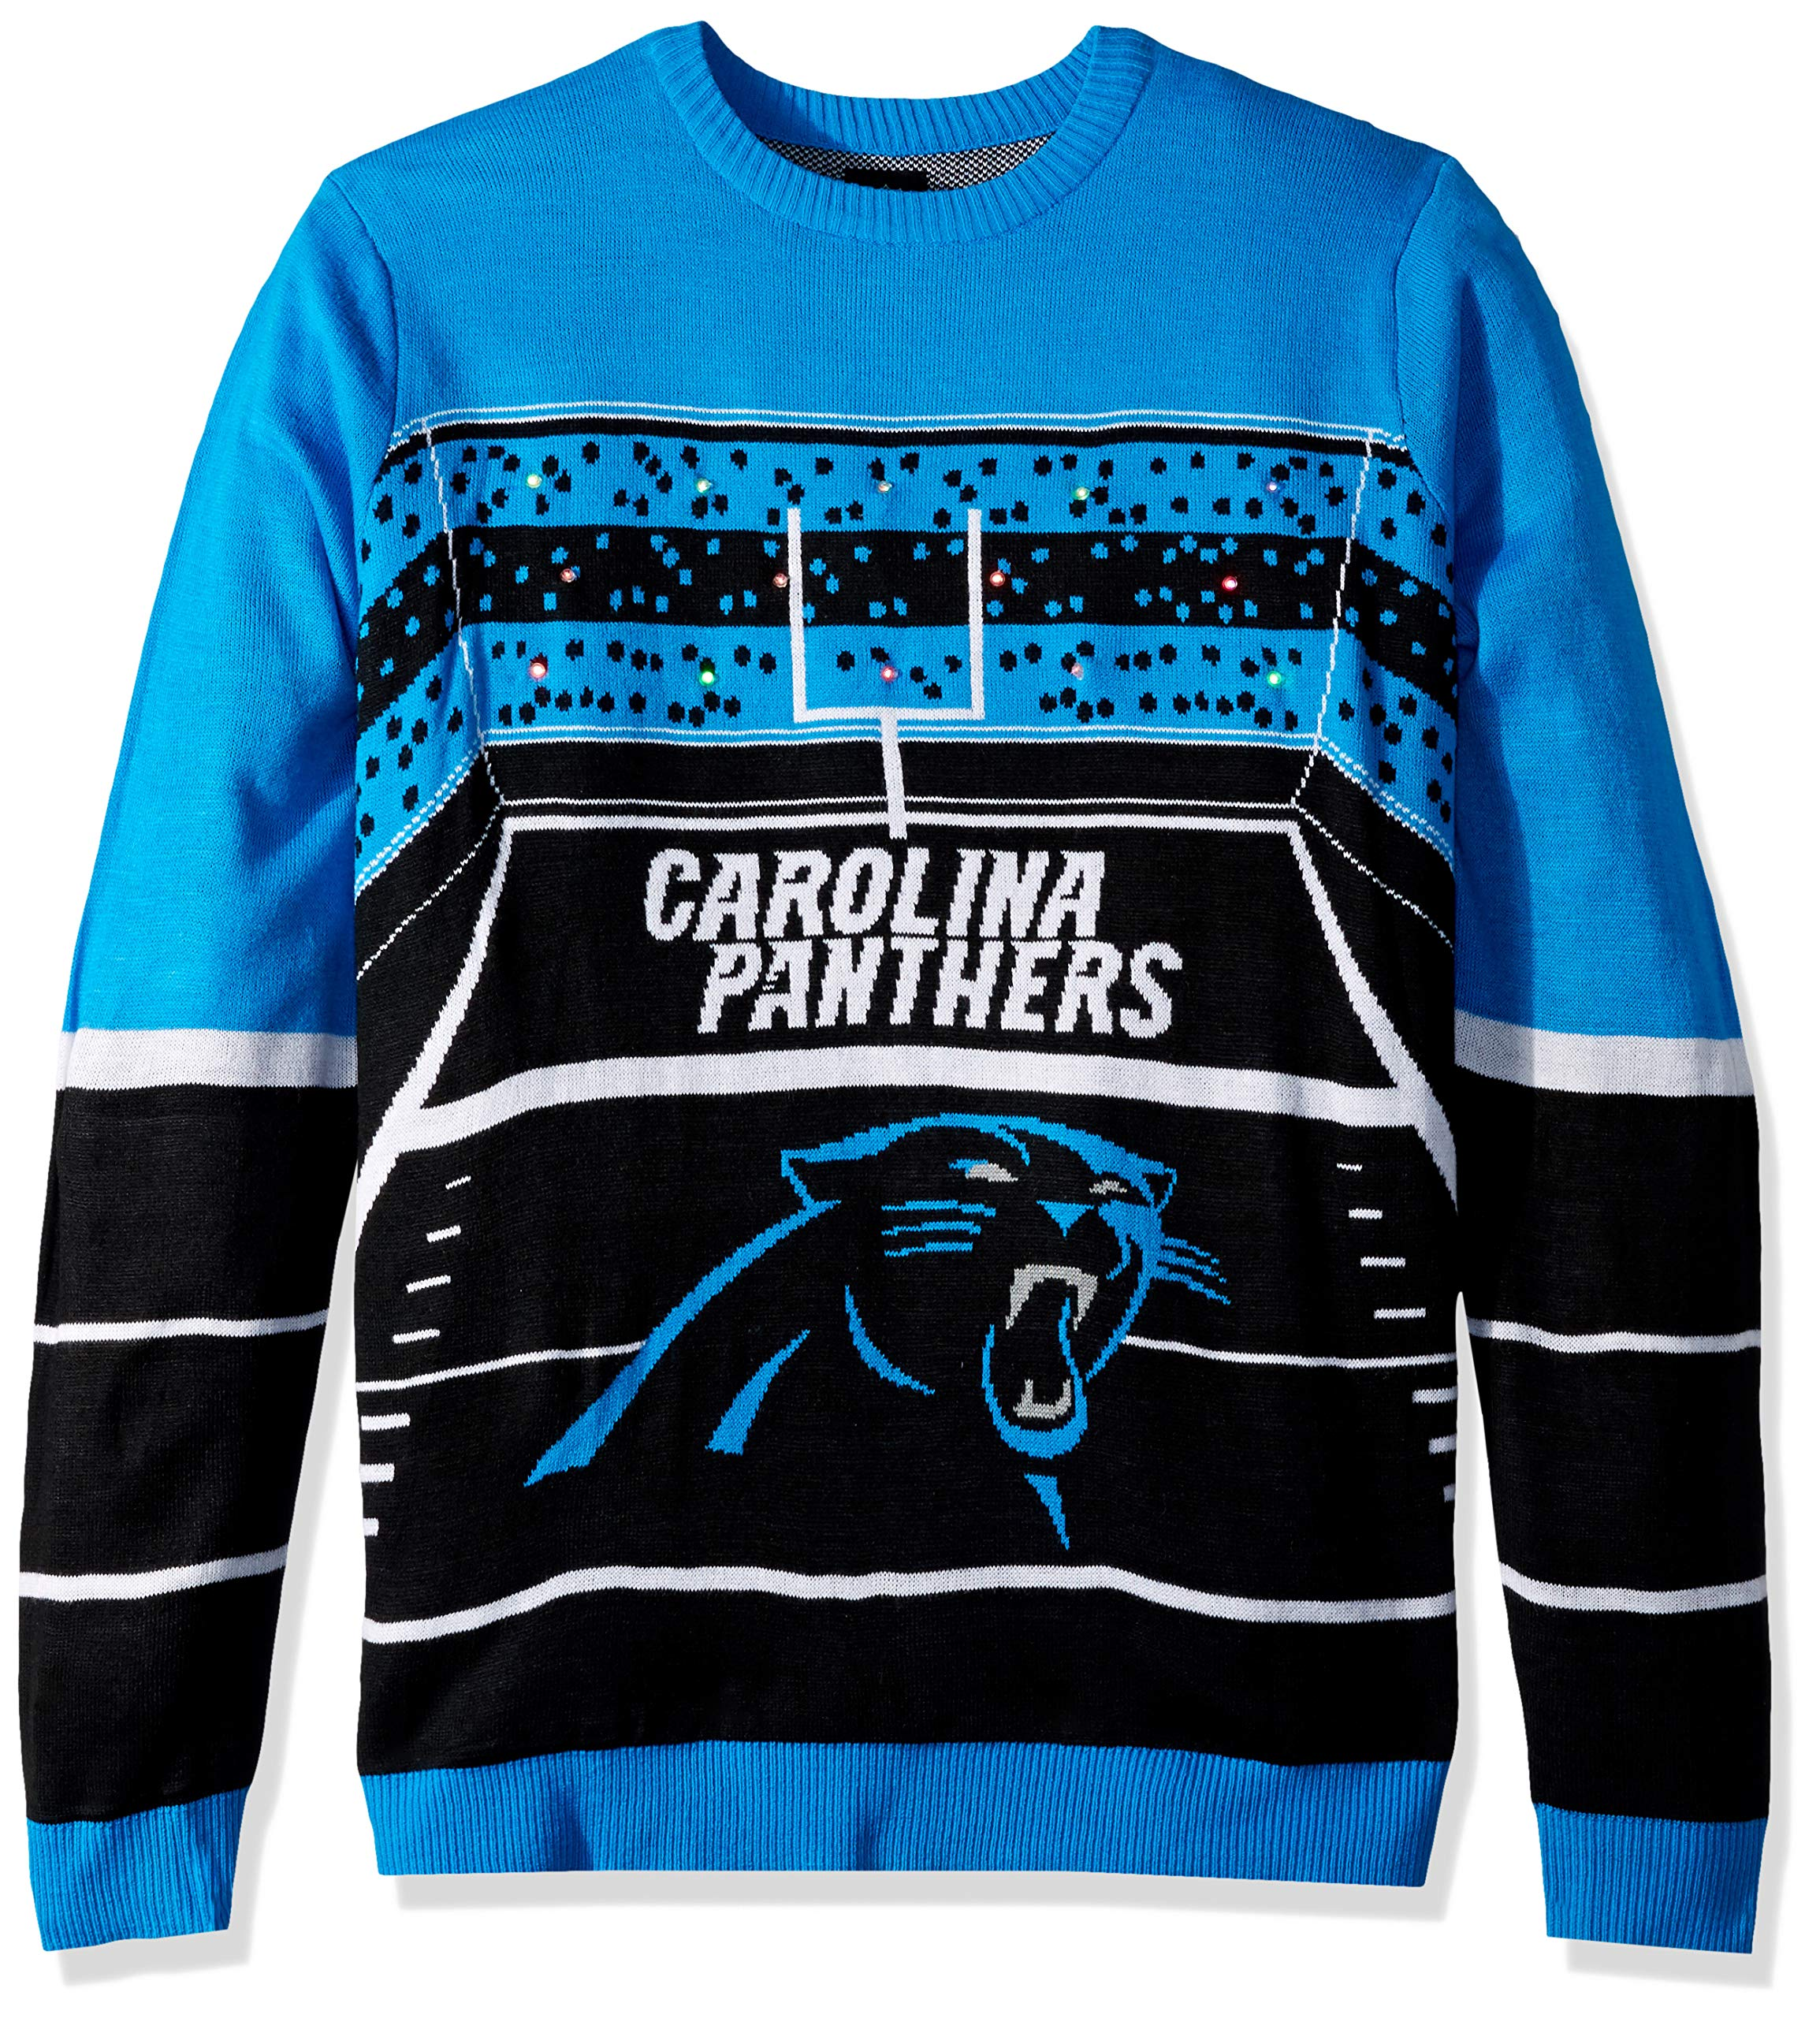 FOCO NFL Carolina Panthers Mens Stadium Light Up Crew Neck Sweaterstadium Light Up Crew Neck Sweater, Team Color, Large